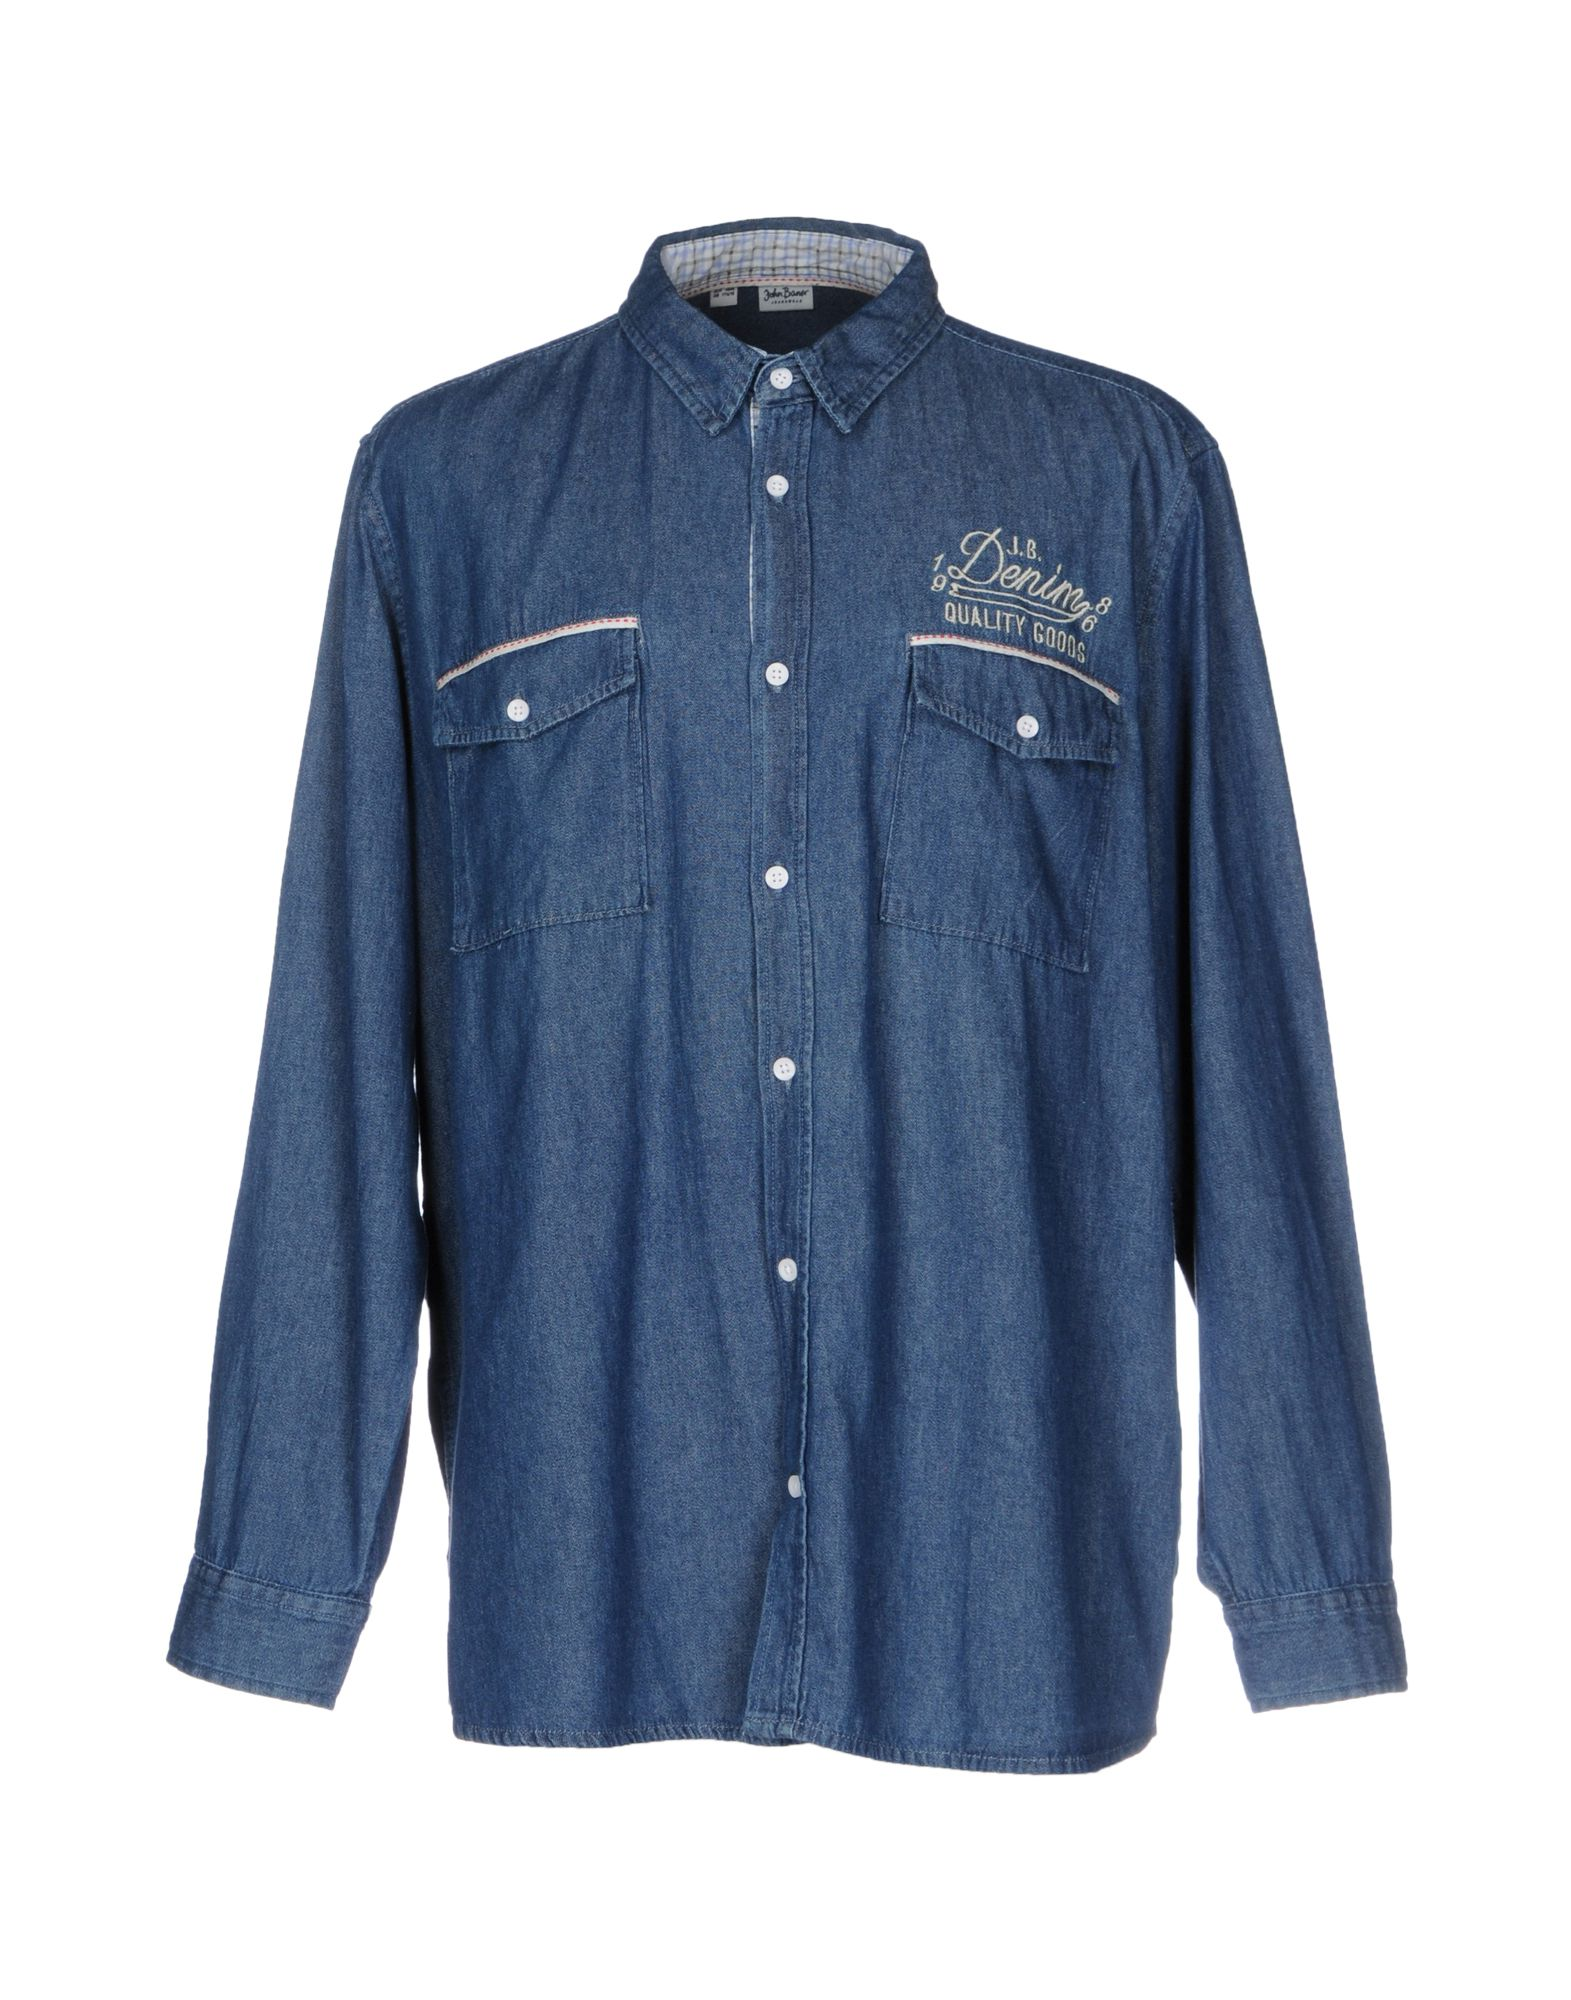 купить JOHN BANER JEANSWEAR Джинсовая рубашка по цене 3900 рублей